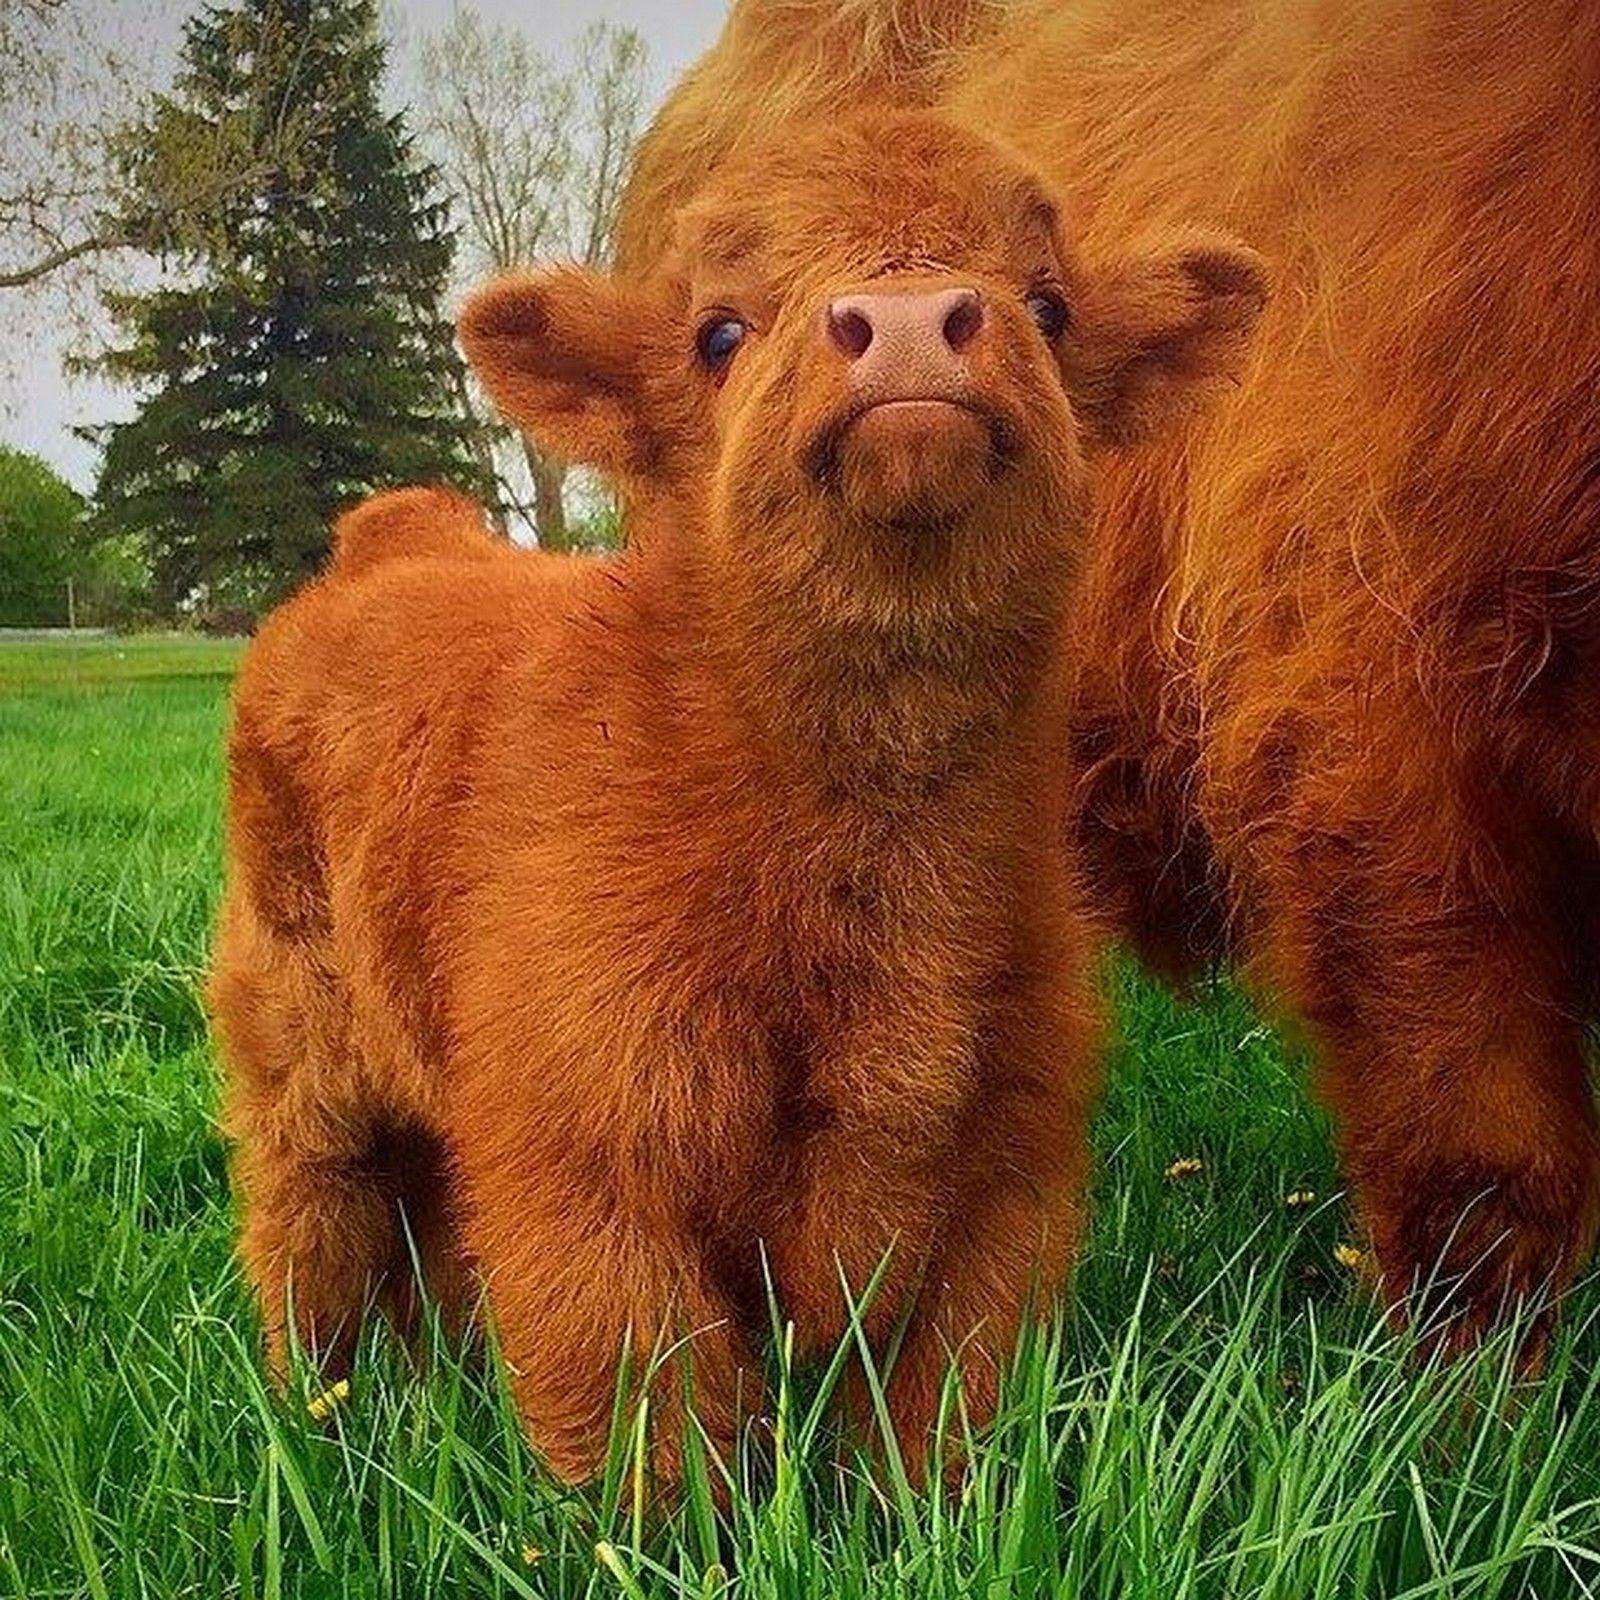 21 Highland Cattle Calf Photos To Bring A Smile To Your Day 21 Highland Cattle Calf Photos To Bring A Smile To Your Day Fluffy Cows Cute Baby Cow Baby Cows